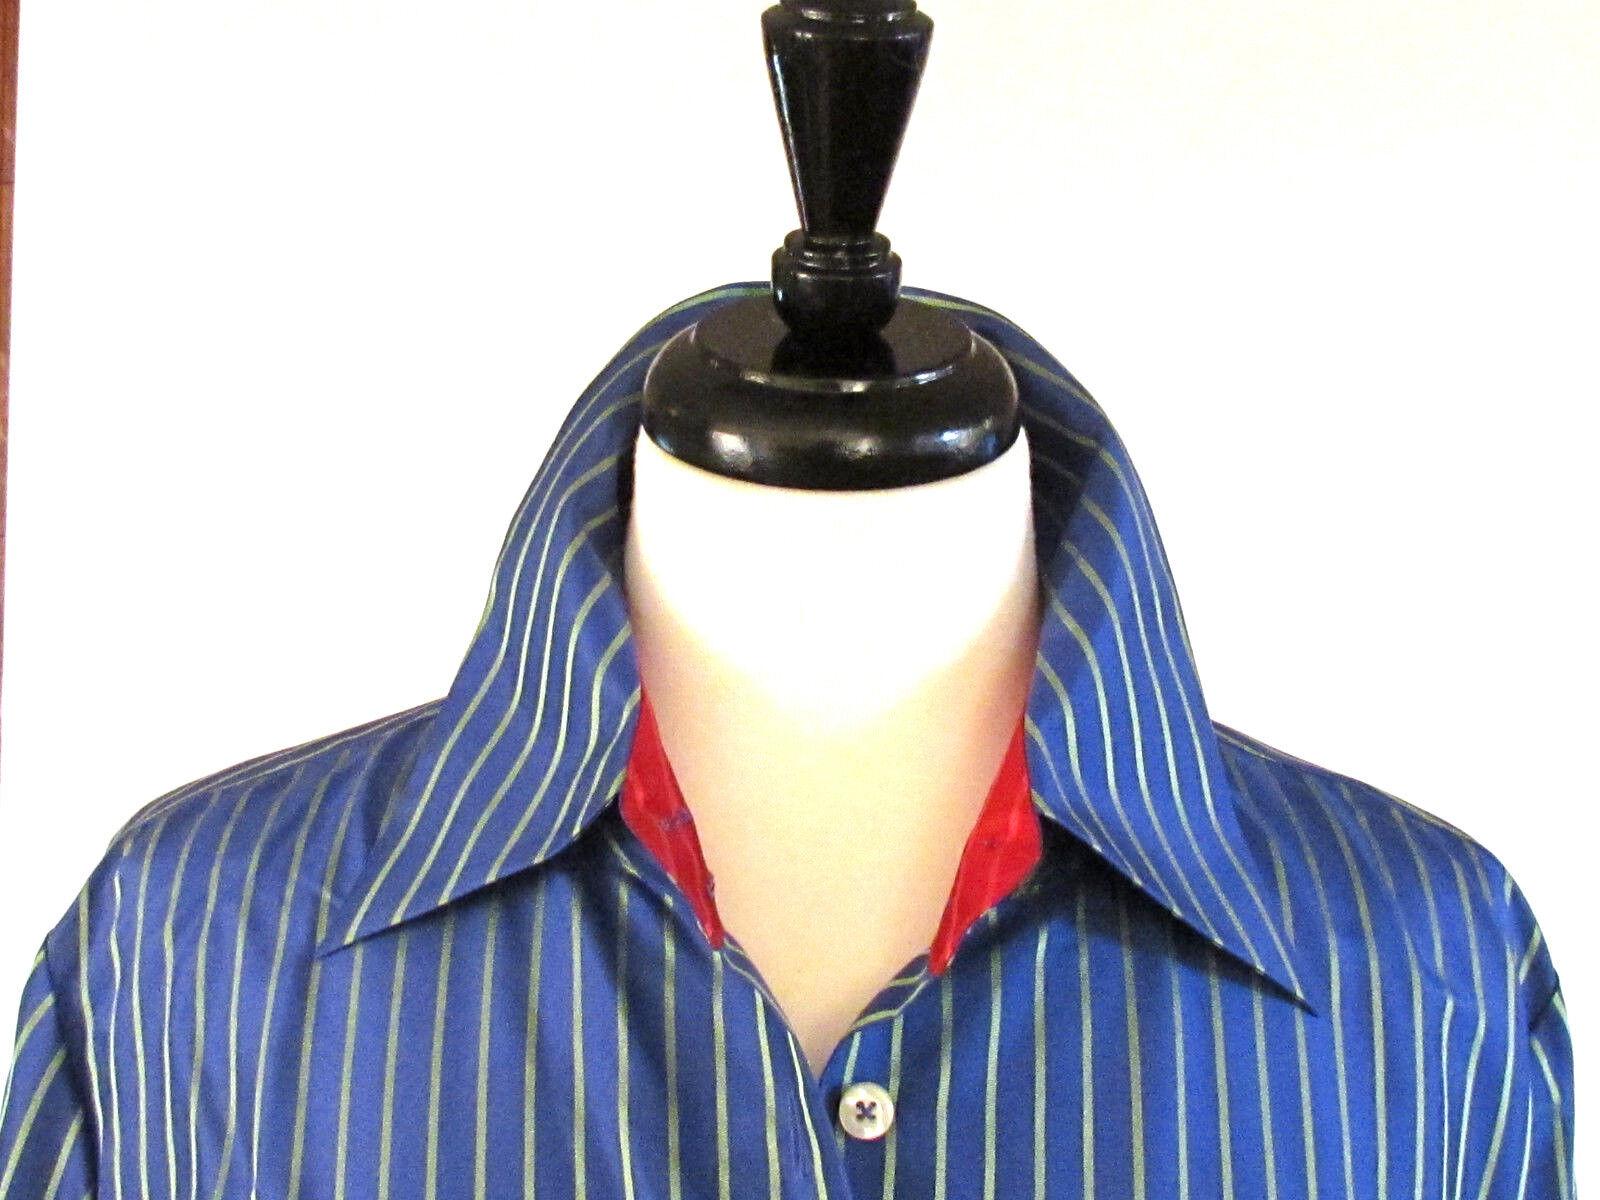 Woherren Blouses Shirts Tops Designer Blouses H Hilfiger Striped 100% Silk  14.R